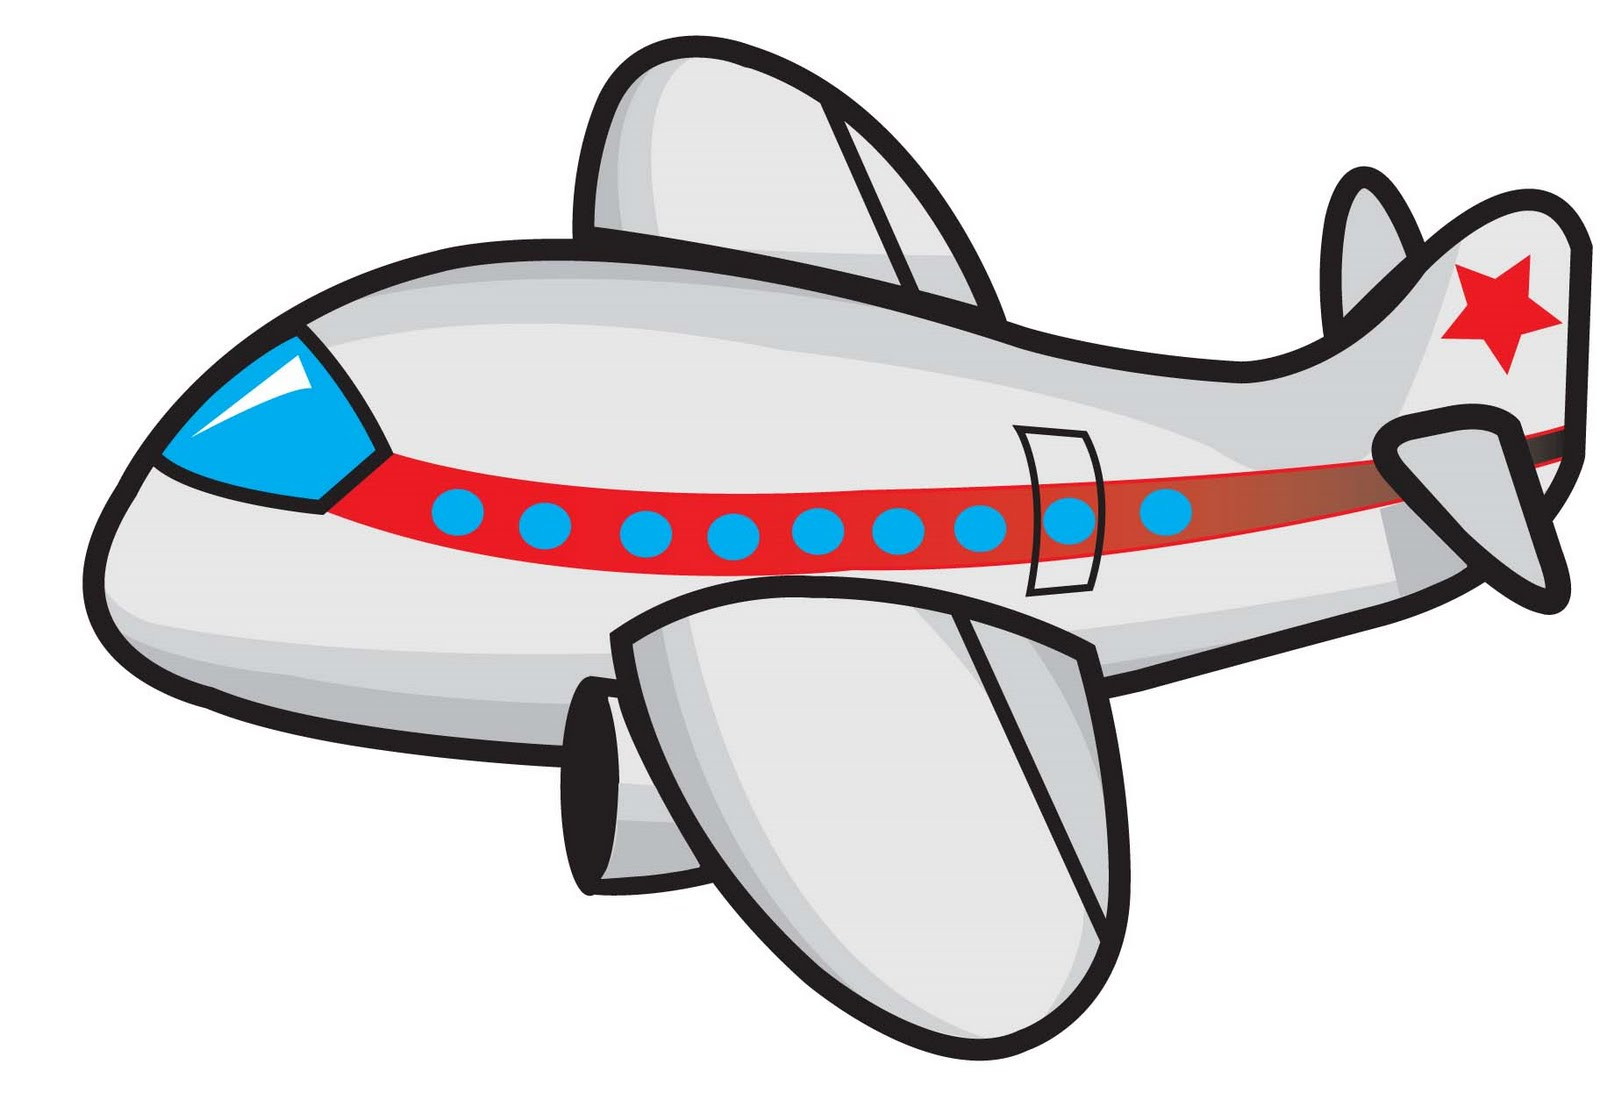 Cartoon Airplane Image.